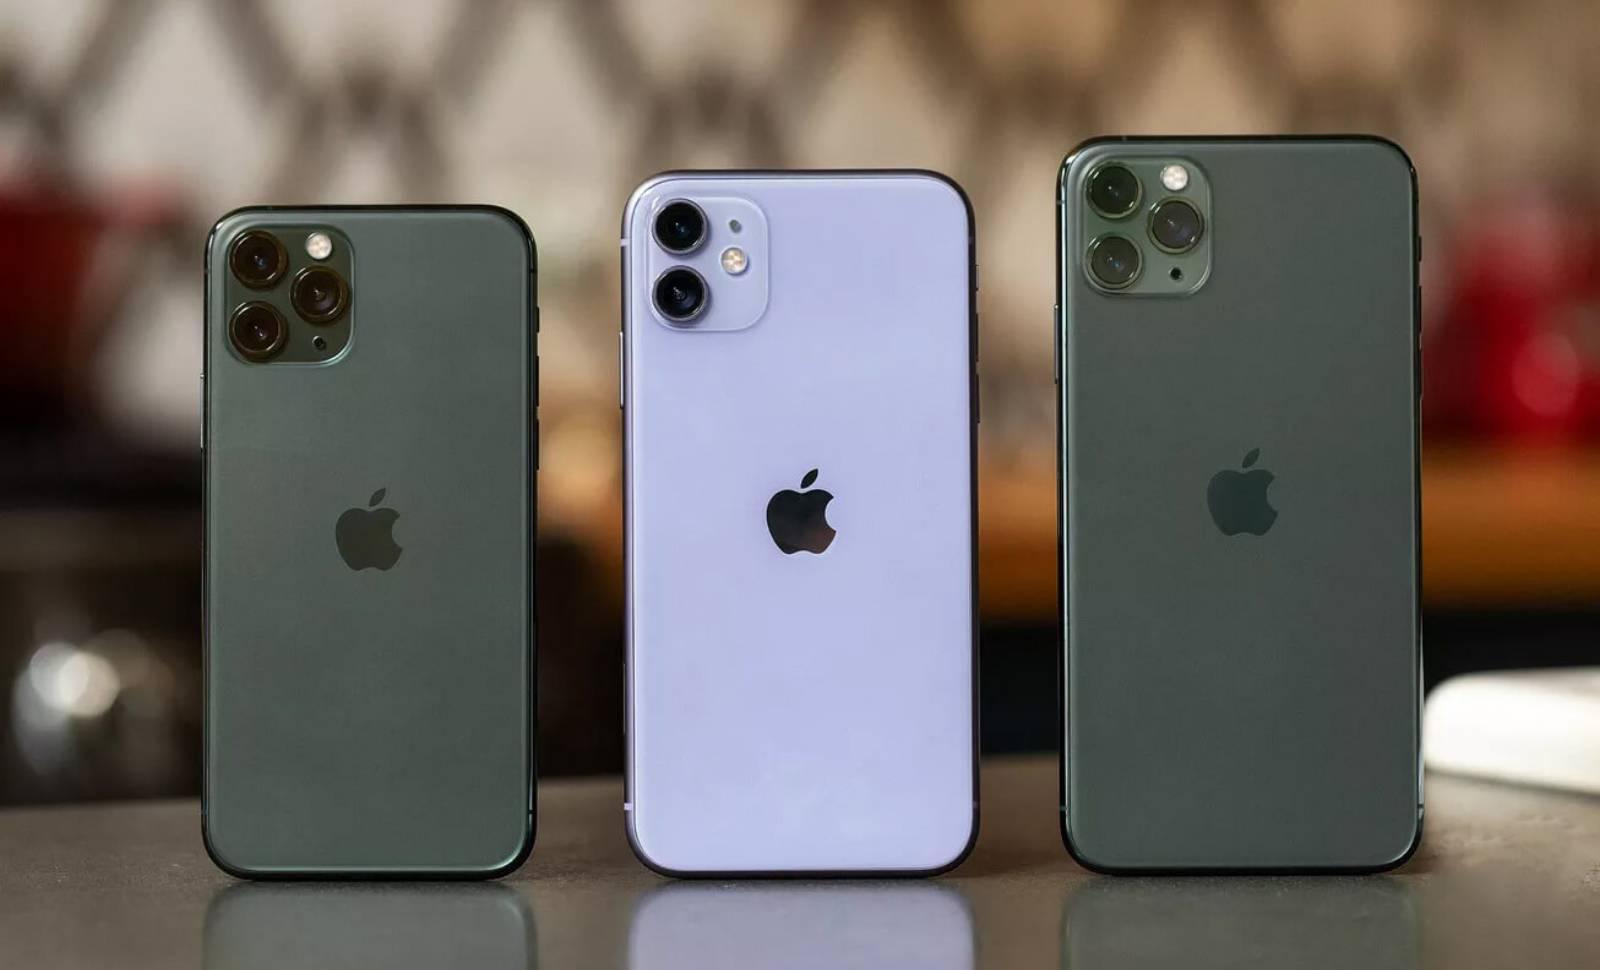 iPhone 11 DISTRUGE Huawei apple